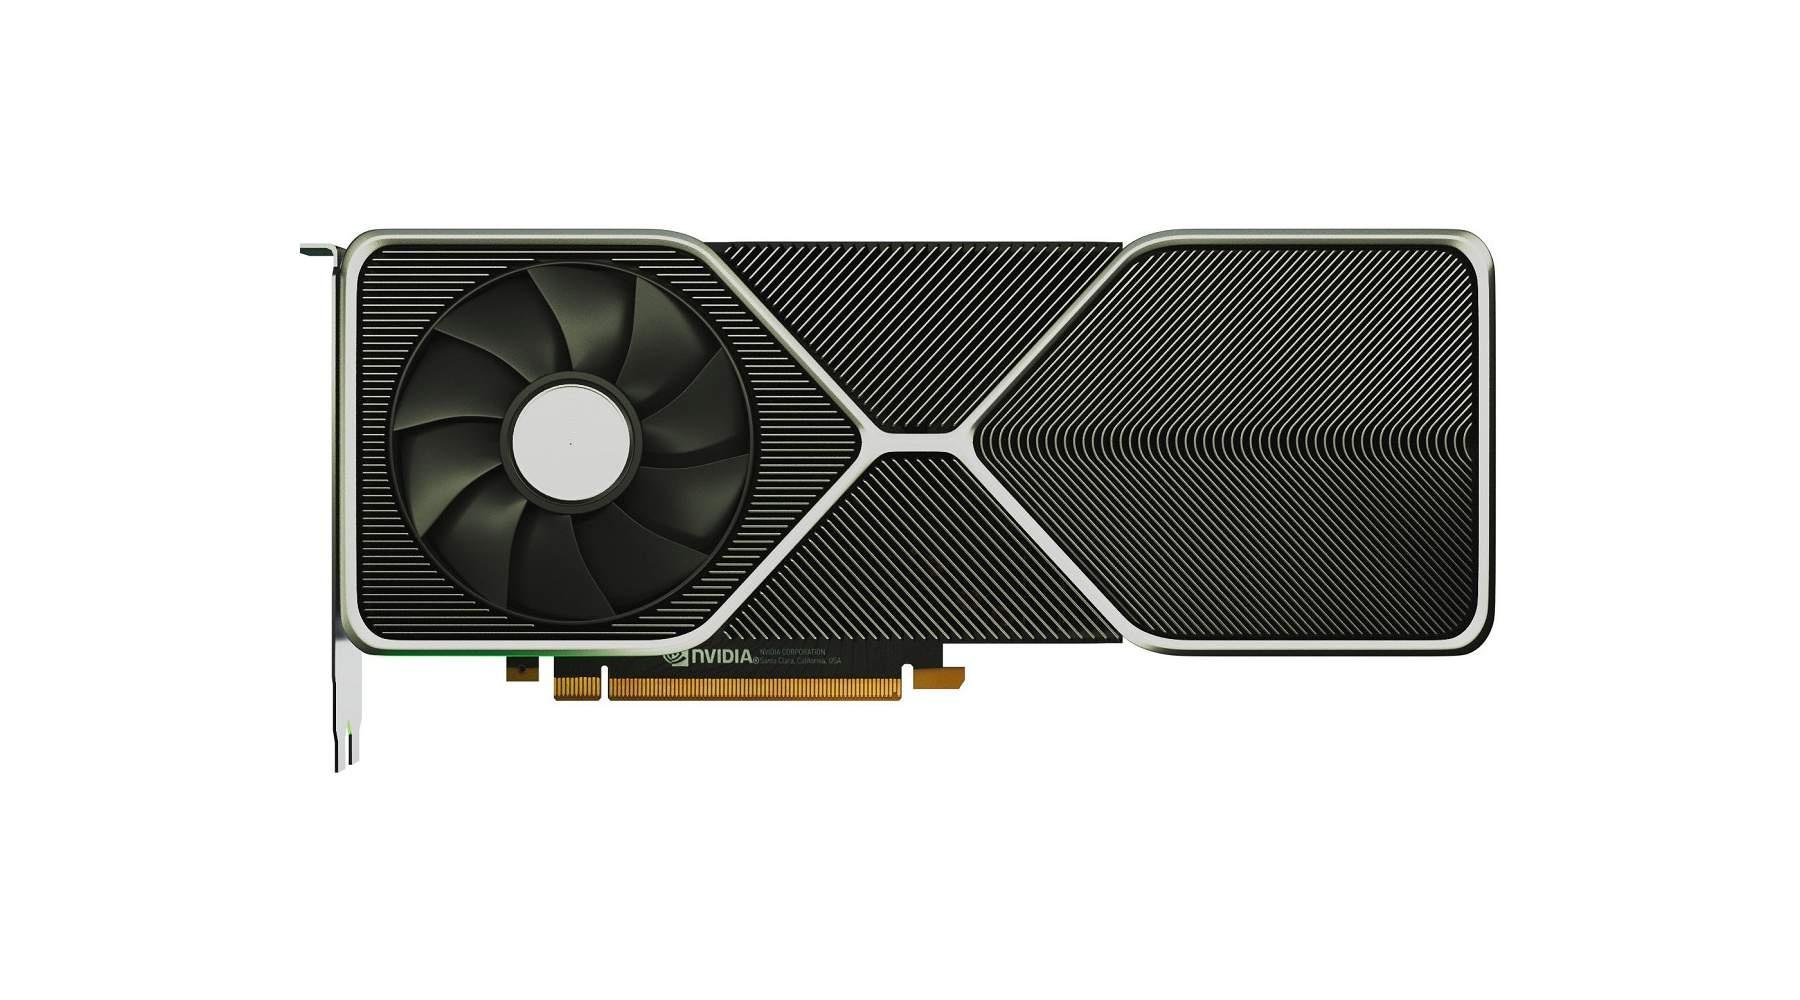 Видеокарты NVIDIA GeForce RTX 3000 покажут31 августа? (Обновлено)